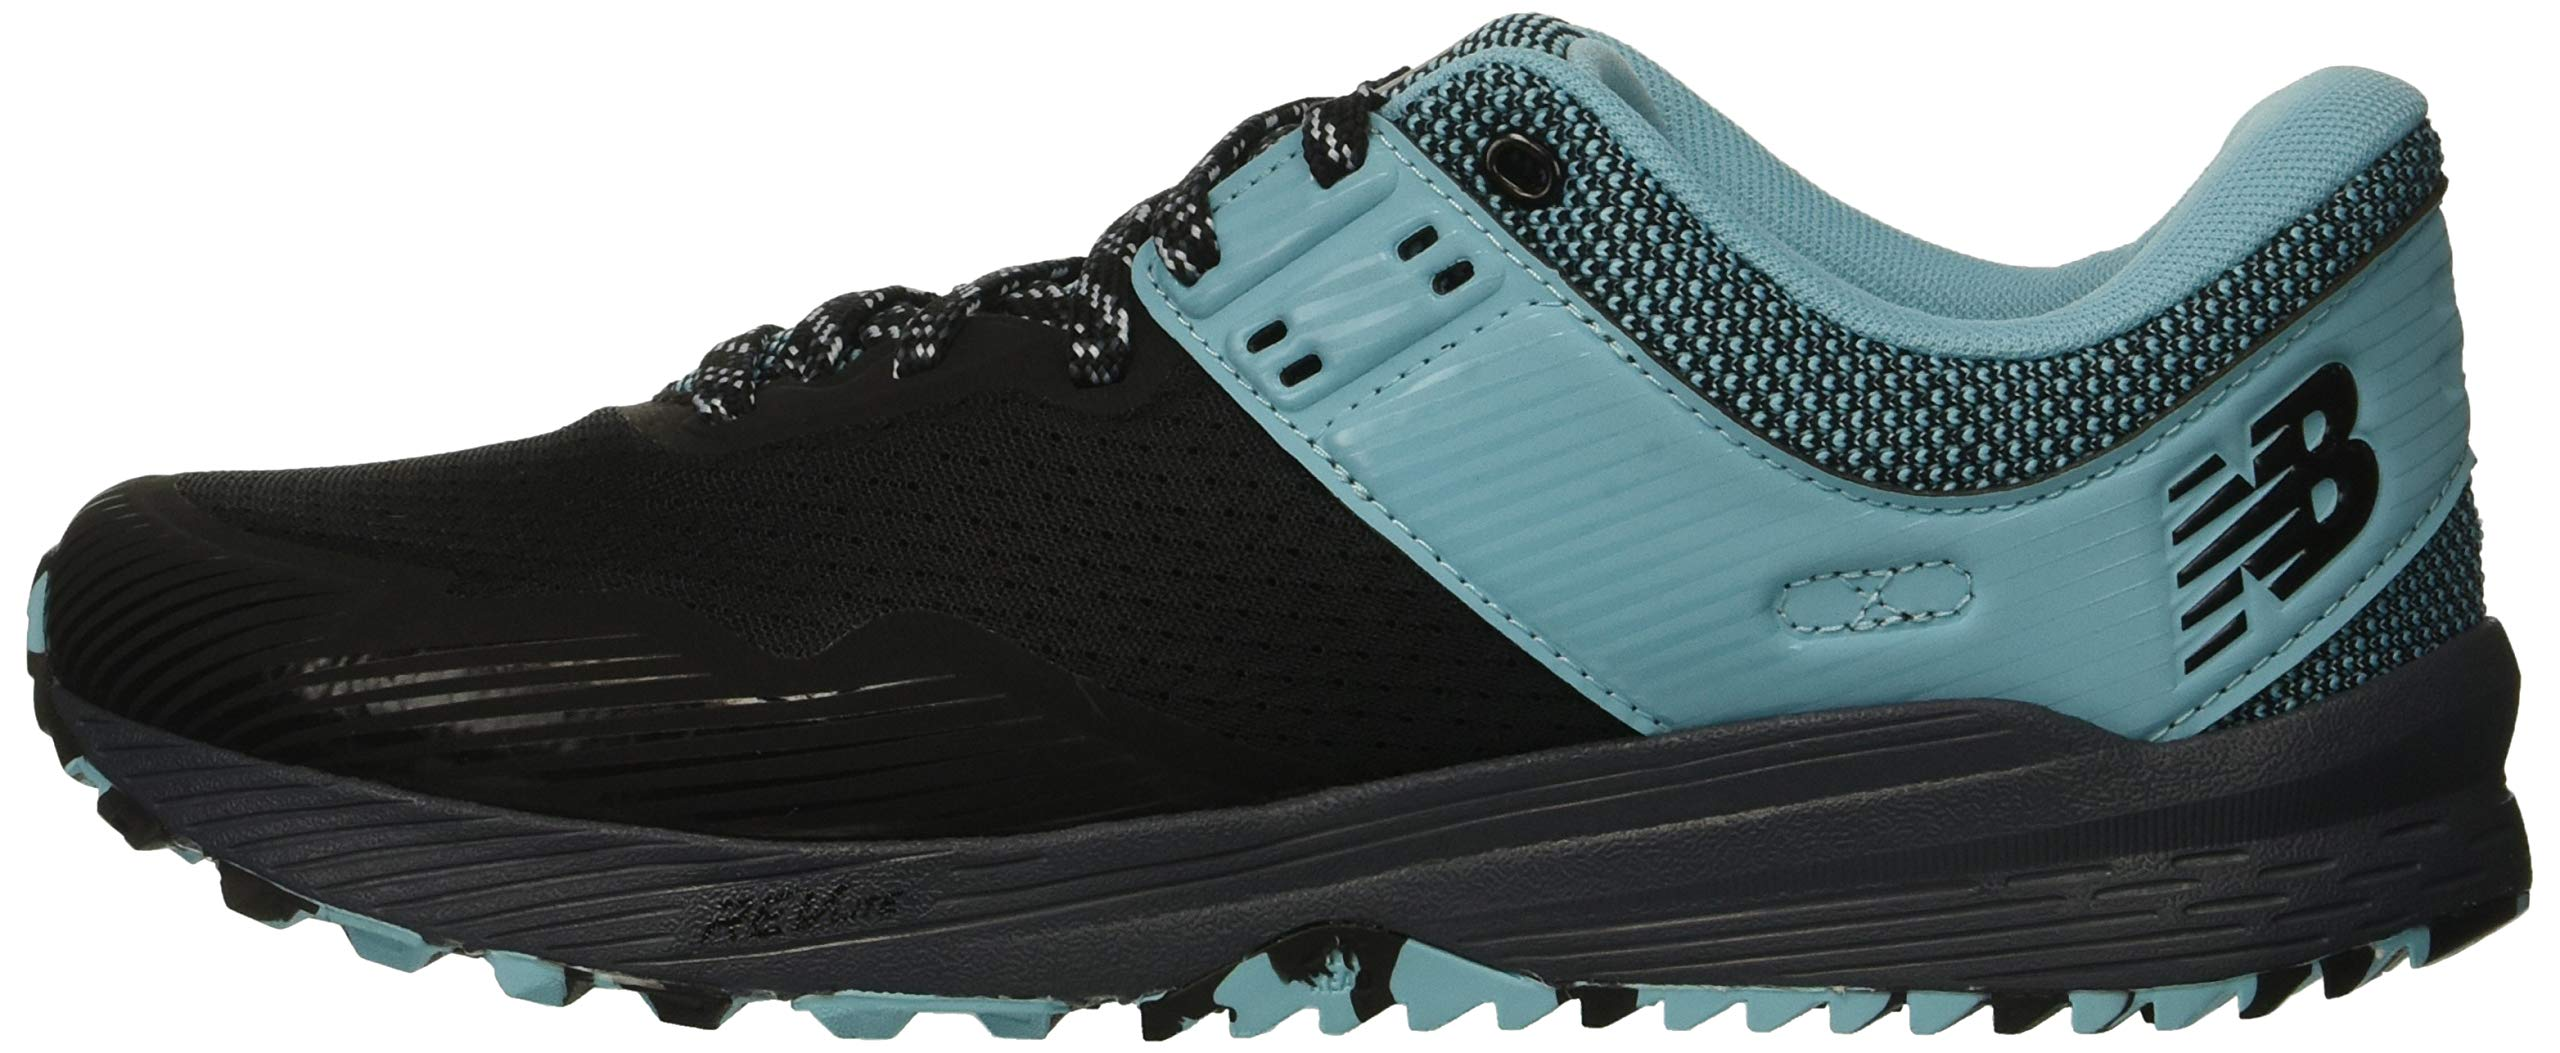 New Balance Women's Nitrel V2 FuelCore Trail Running Shoe Black/Thunder/Enamel Blue 5.5 B US by New Balance (Image #5)